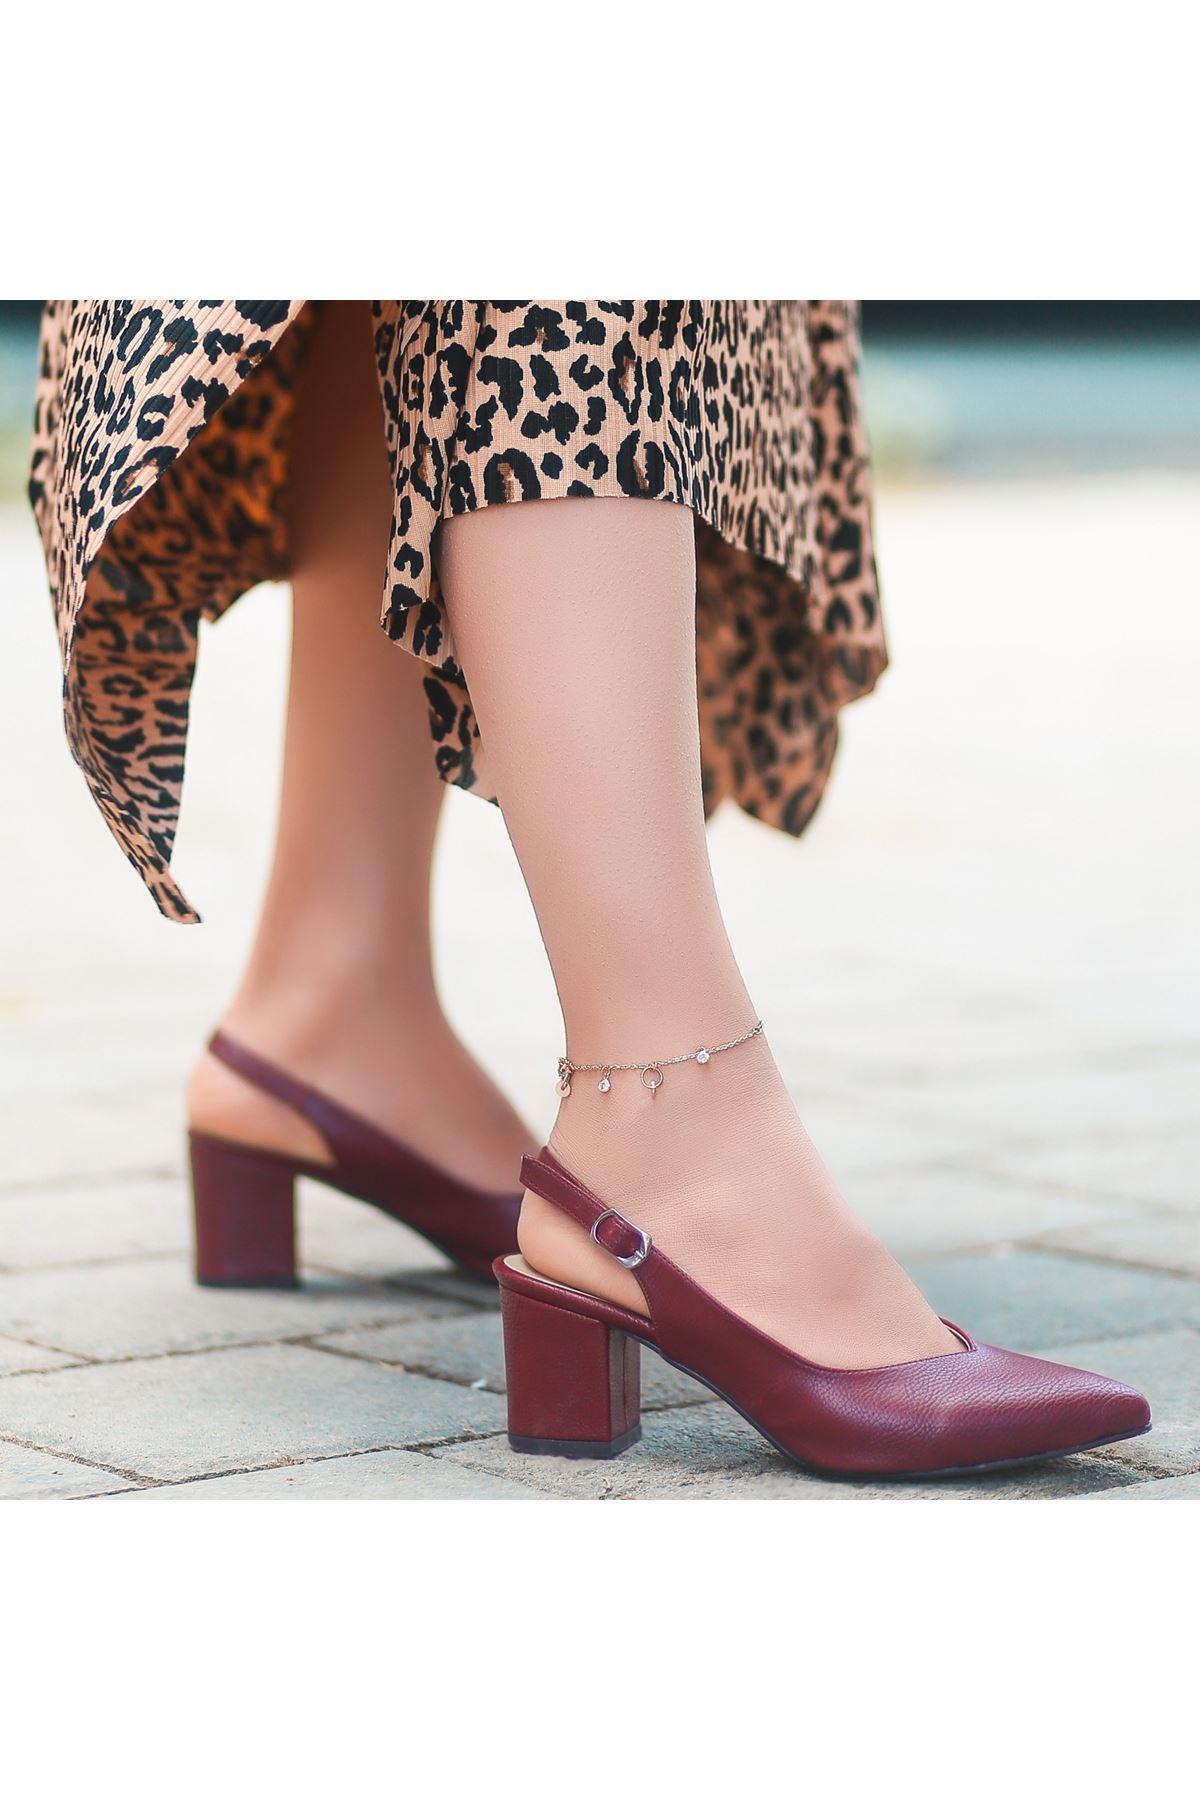 Ziko Bordo Cilt Topuklu Ayakkabı